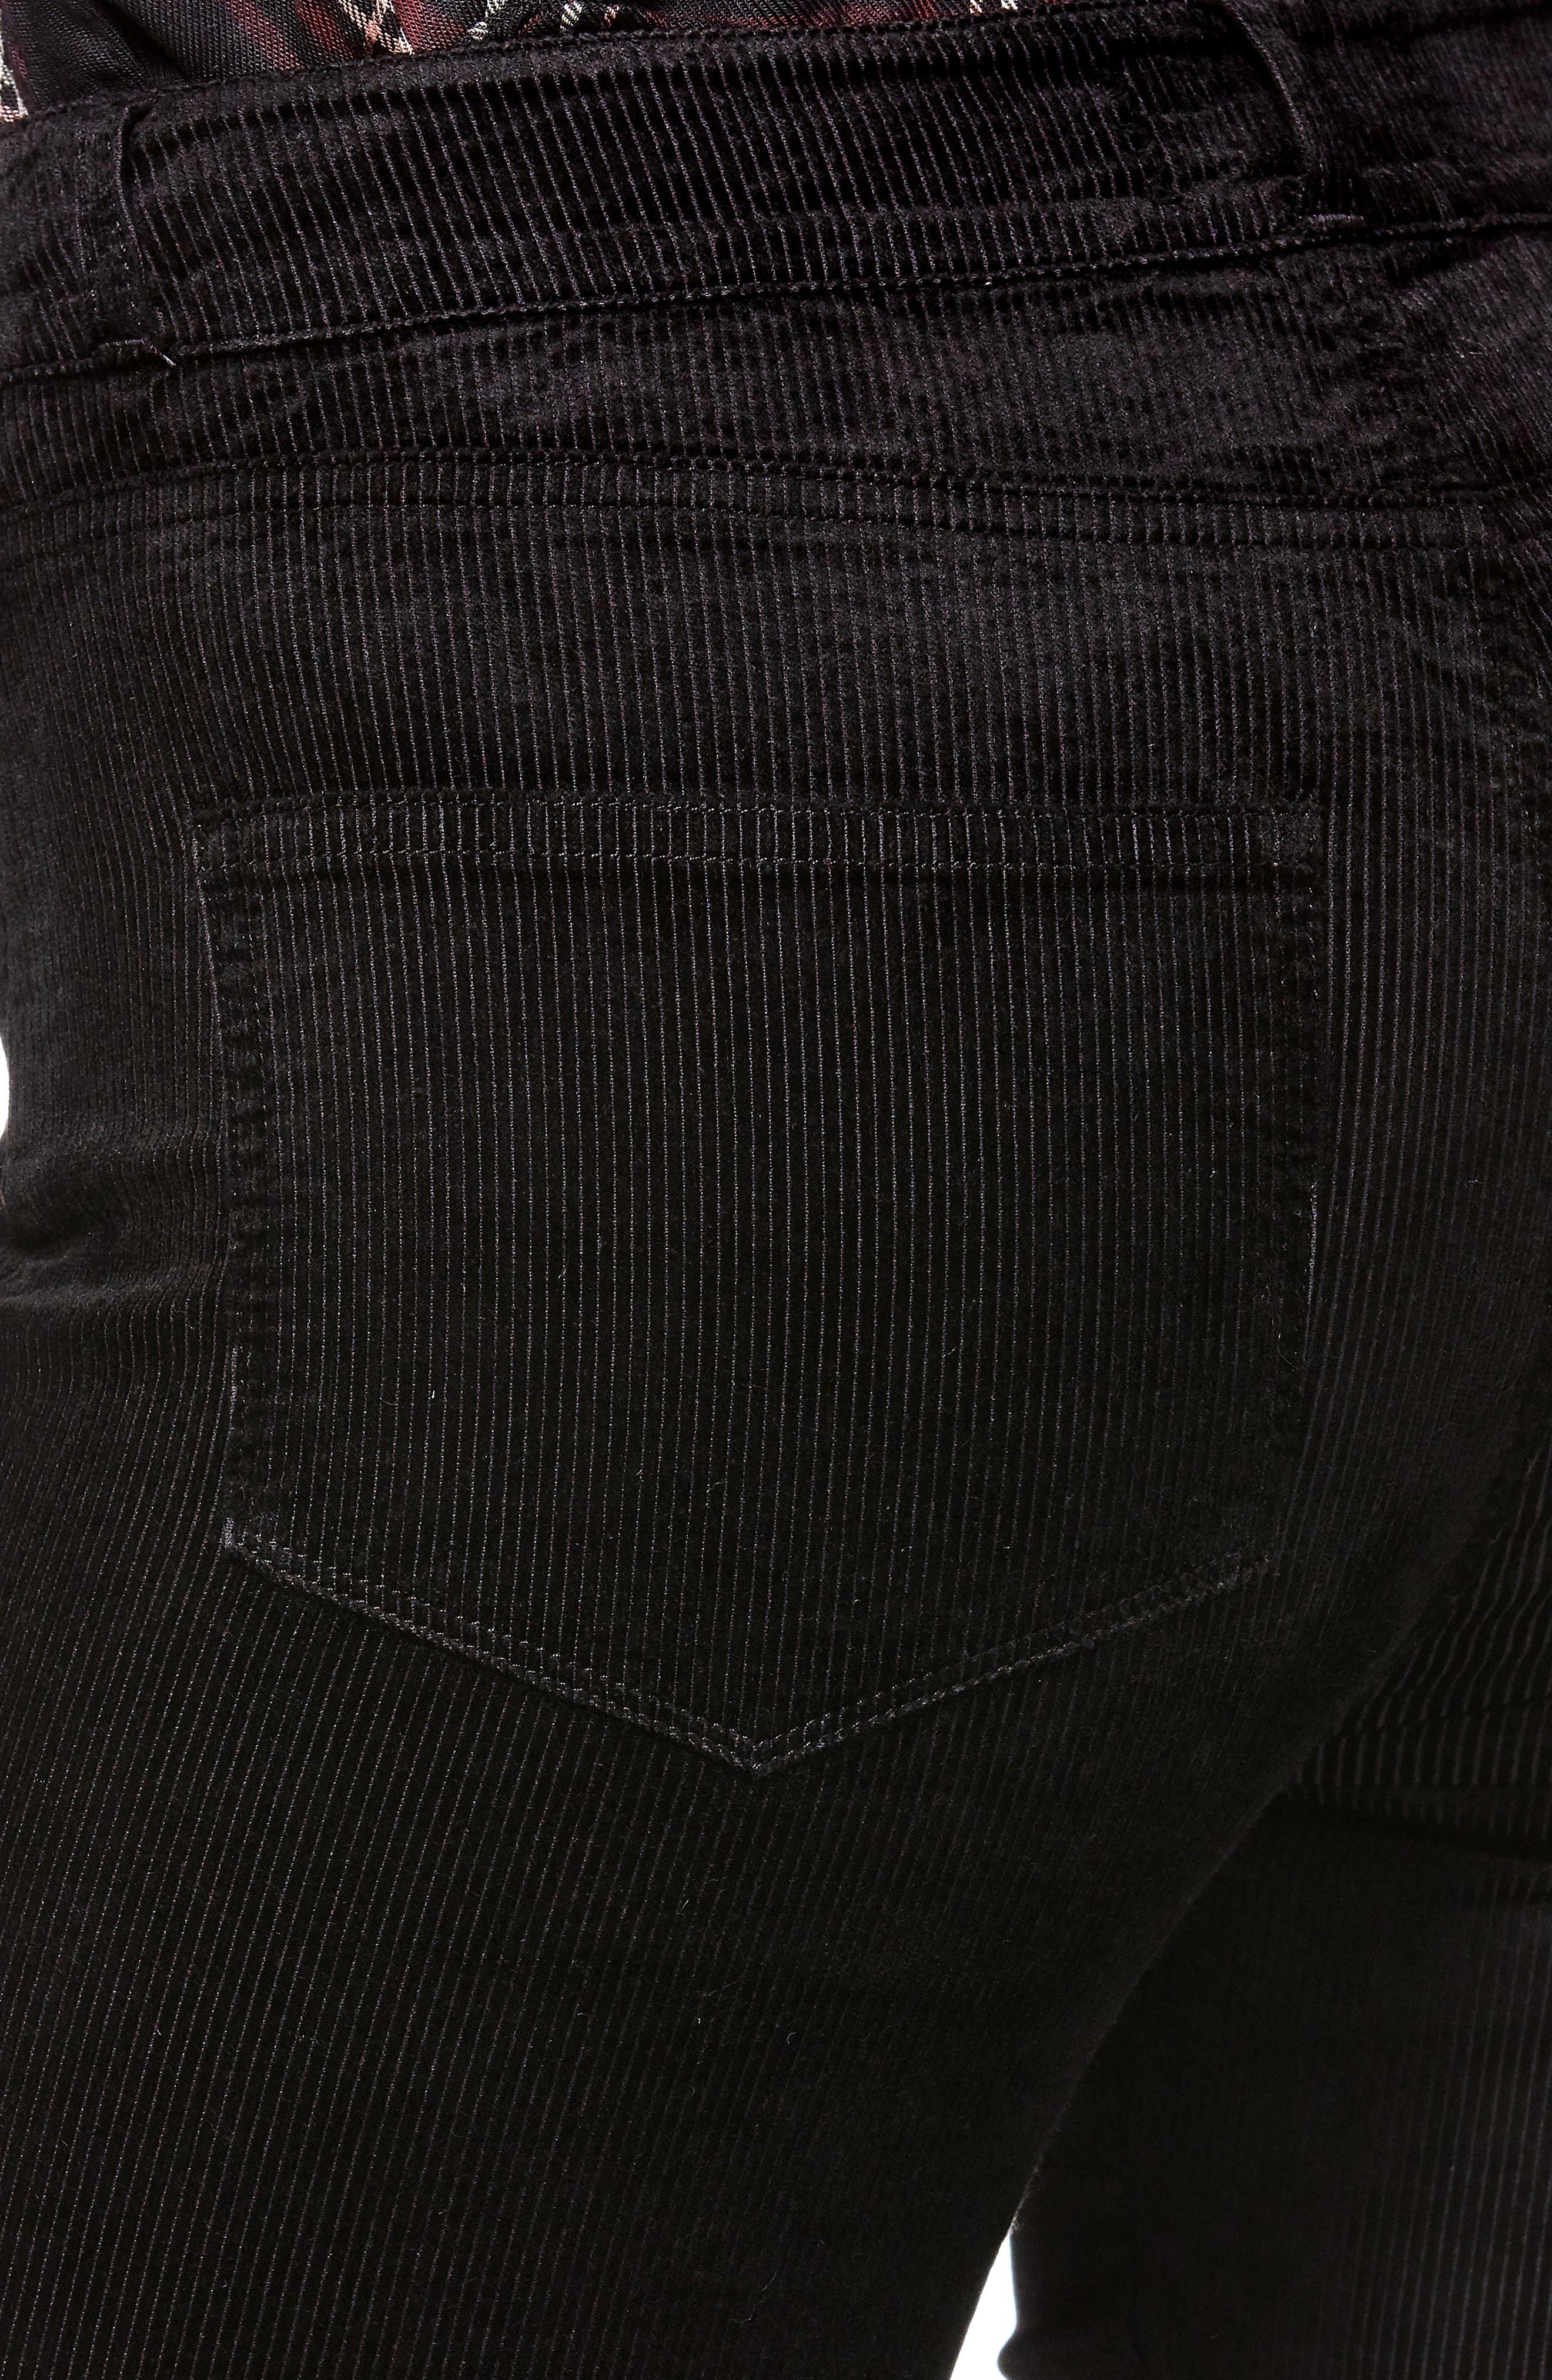 Transcend - Hoxton High Waist Ultra Skinny Jeans,                             Alternate thumbnail 4, color,                             001